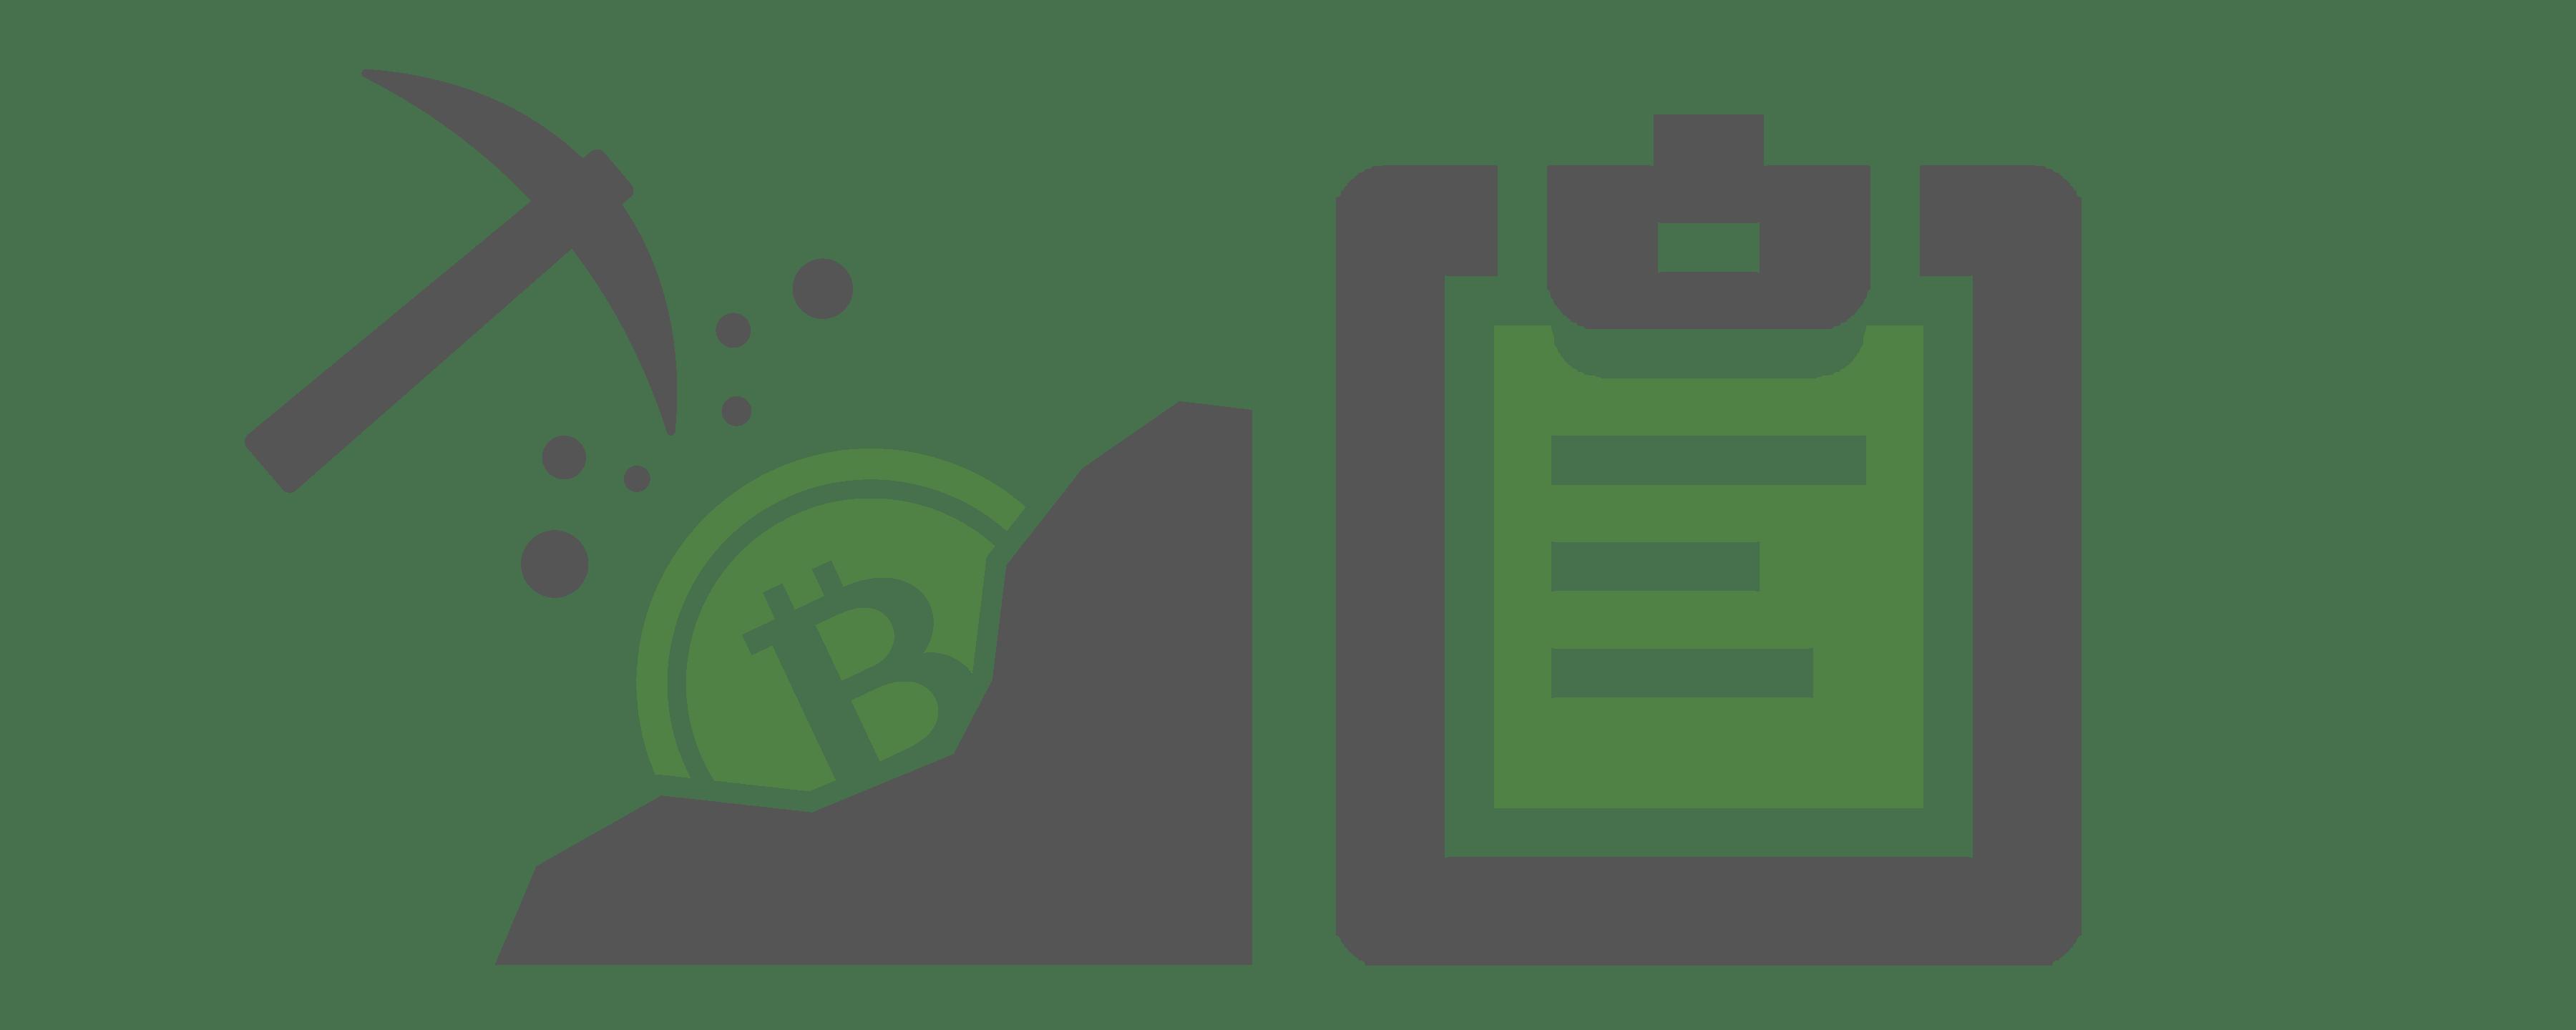 Choosing between bitcoin and. Financial clipart profitability ratio